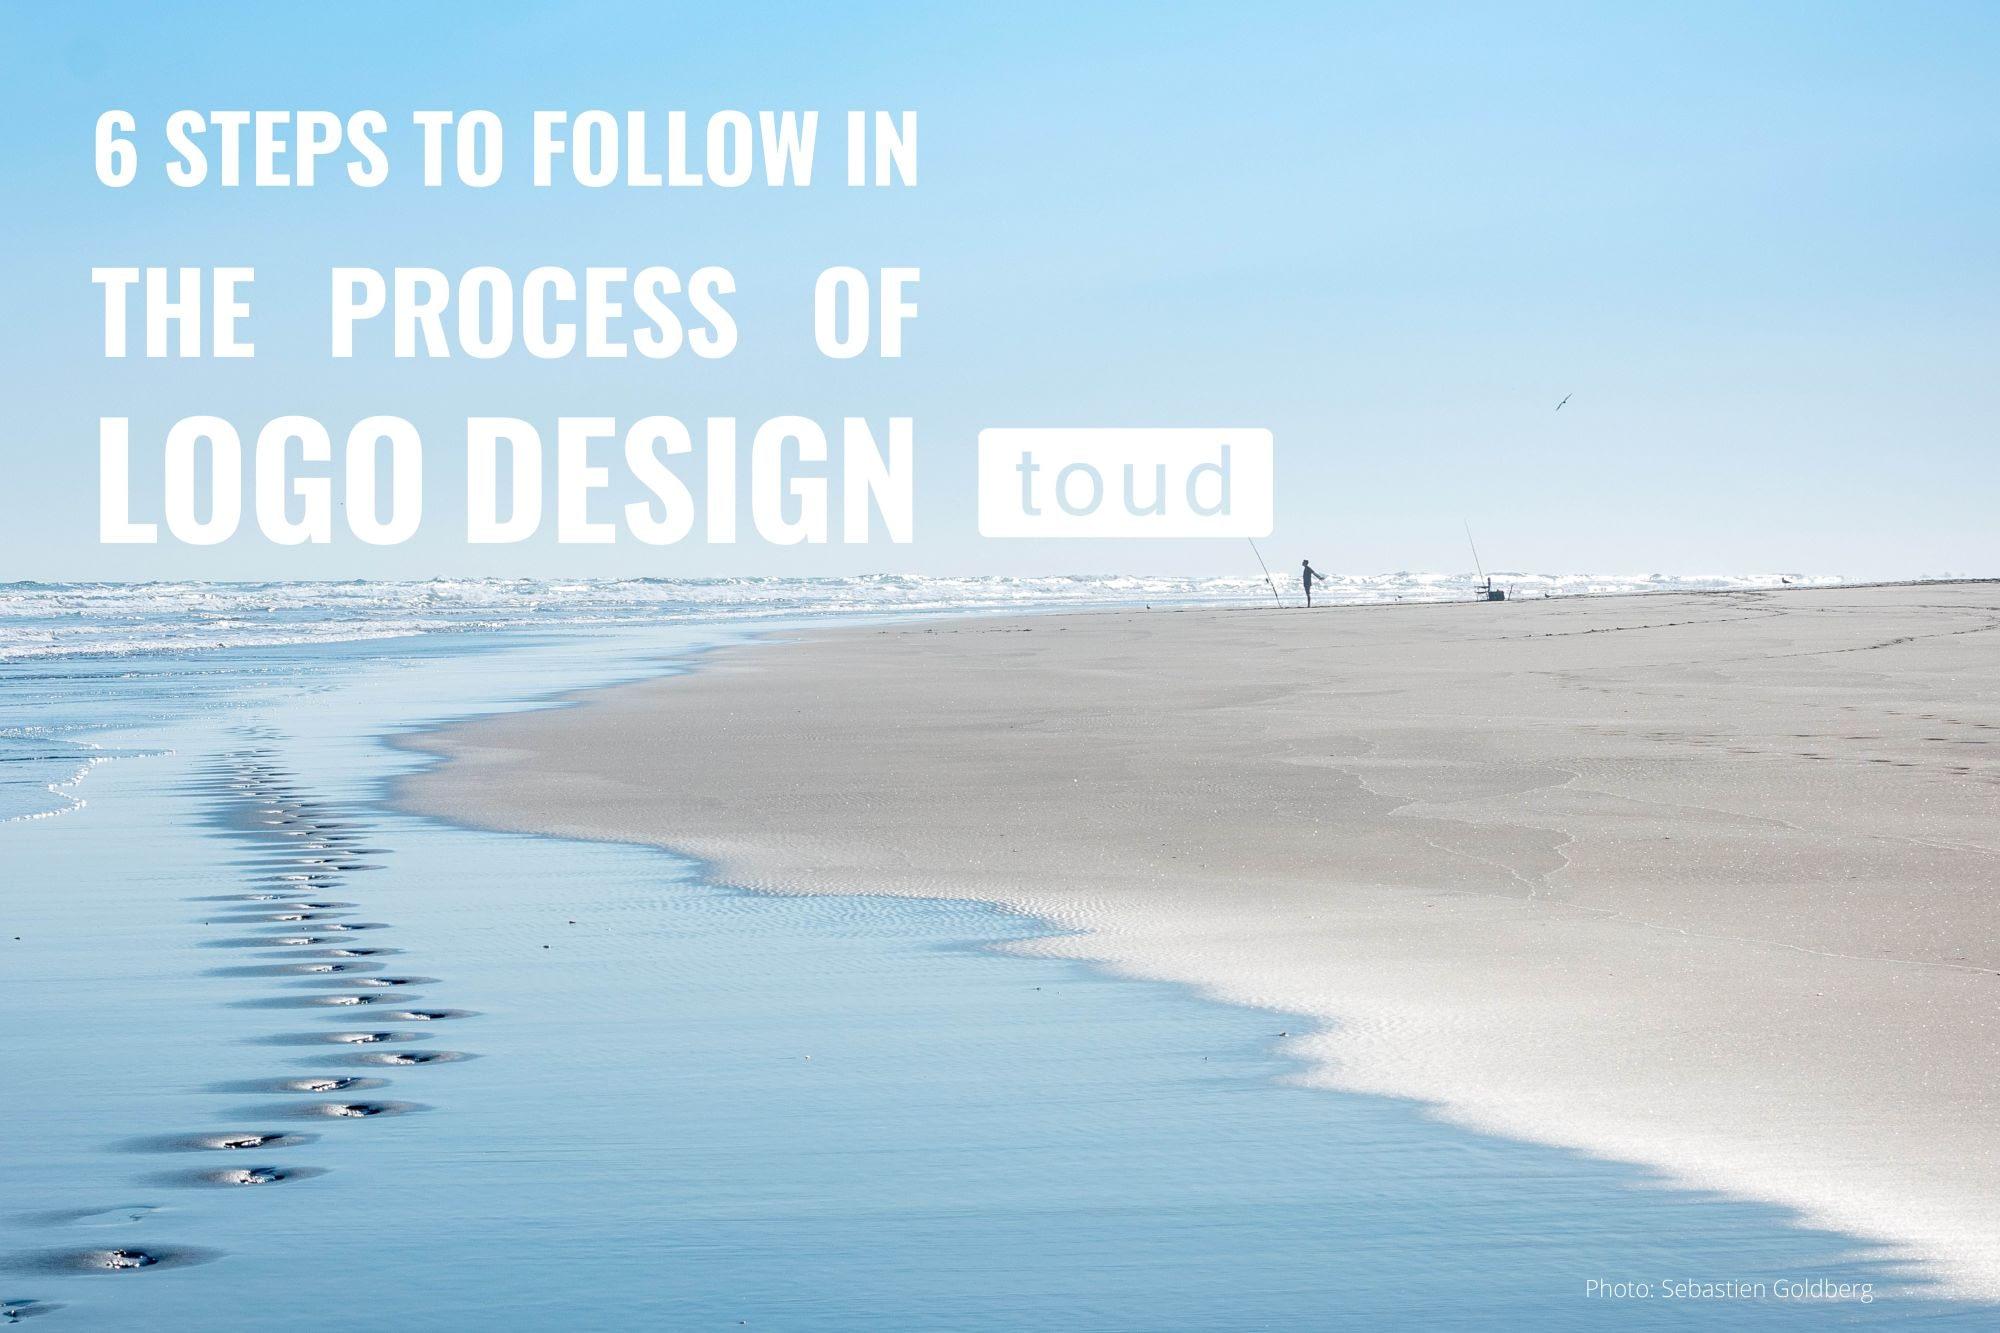 6 steps to follow in the logo design process, logo, design, logo design, visual identity, banding